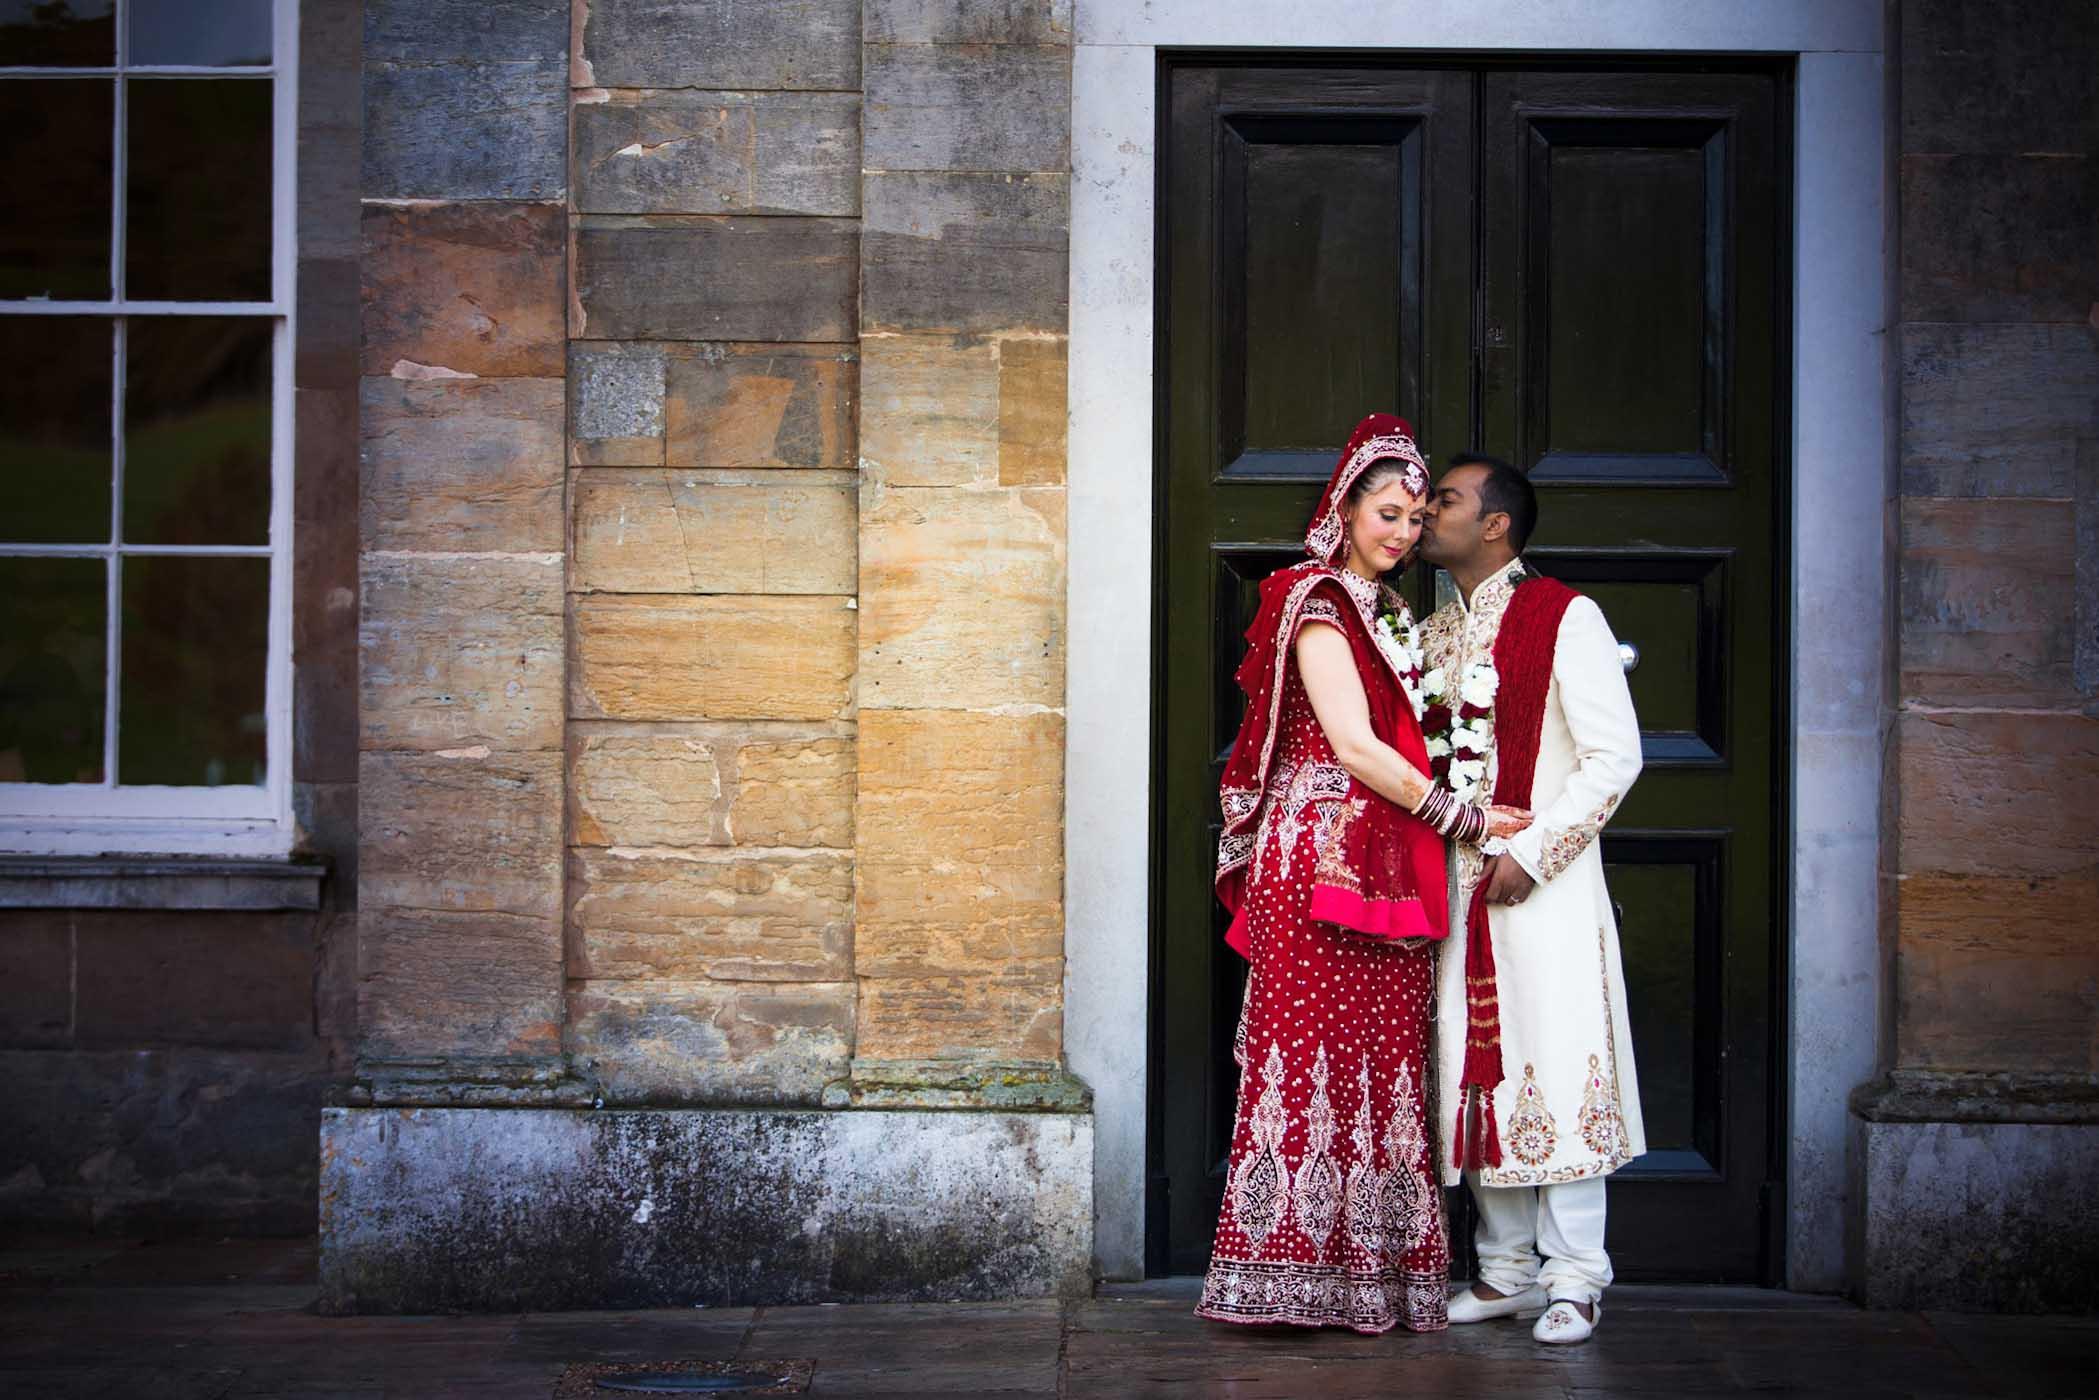 dan_burman_wedding_photography (3).jpg